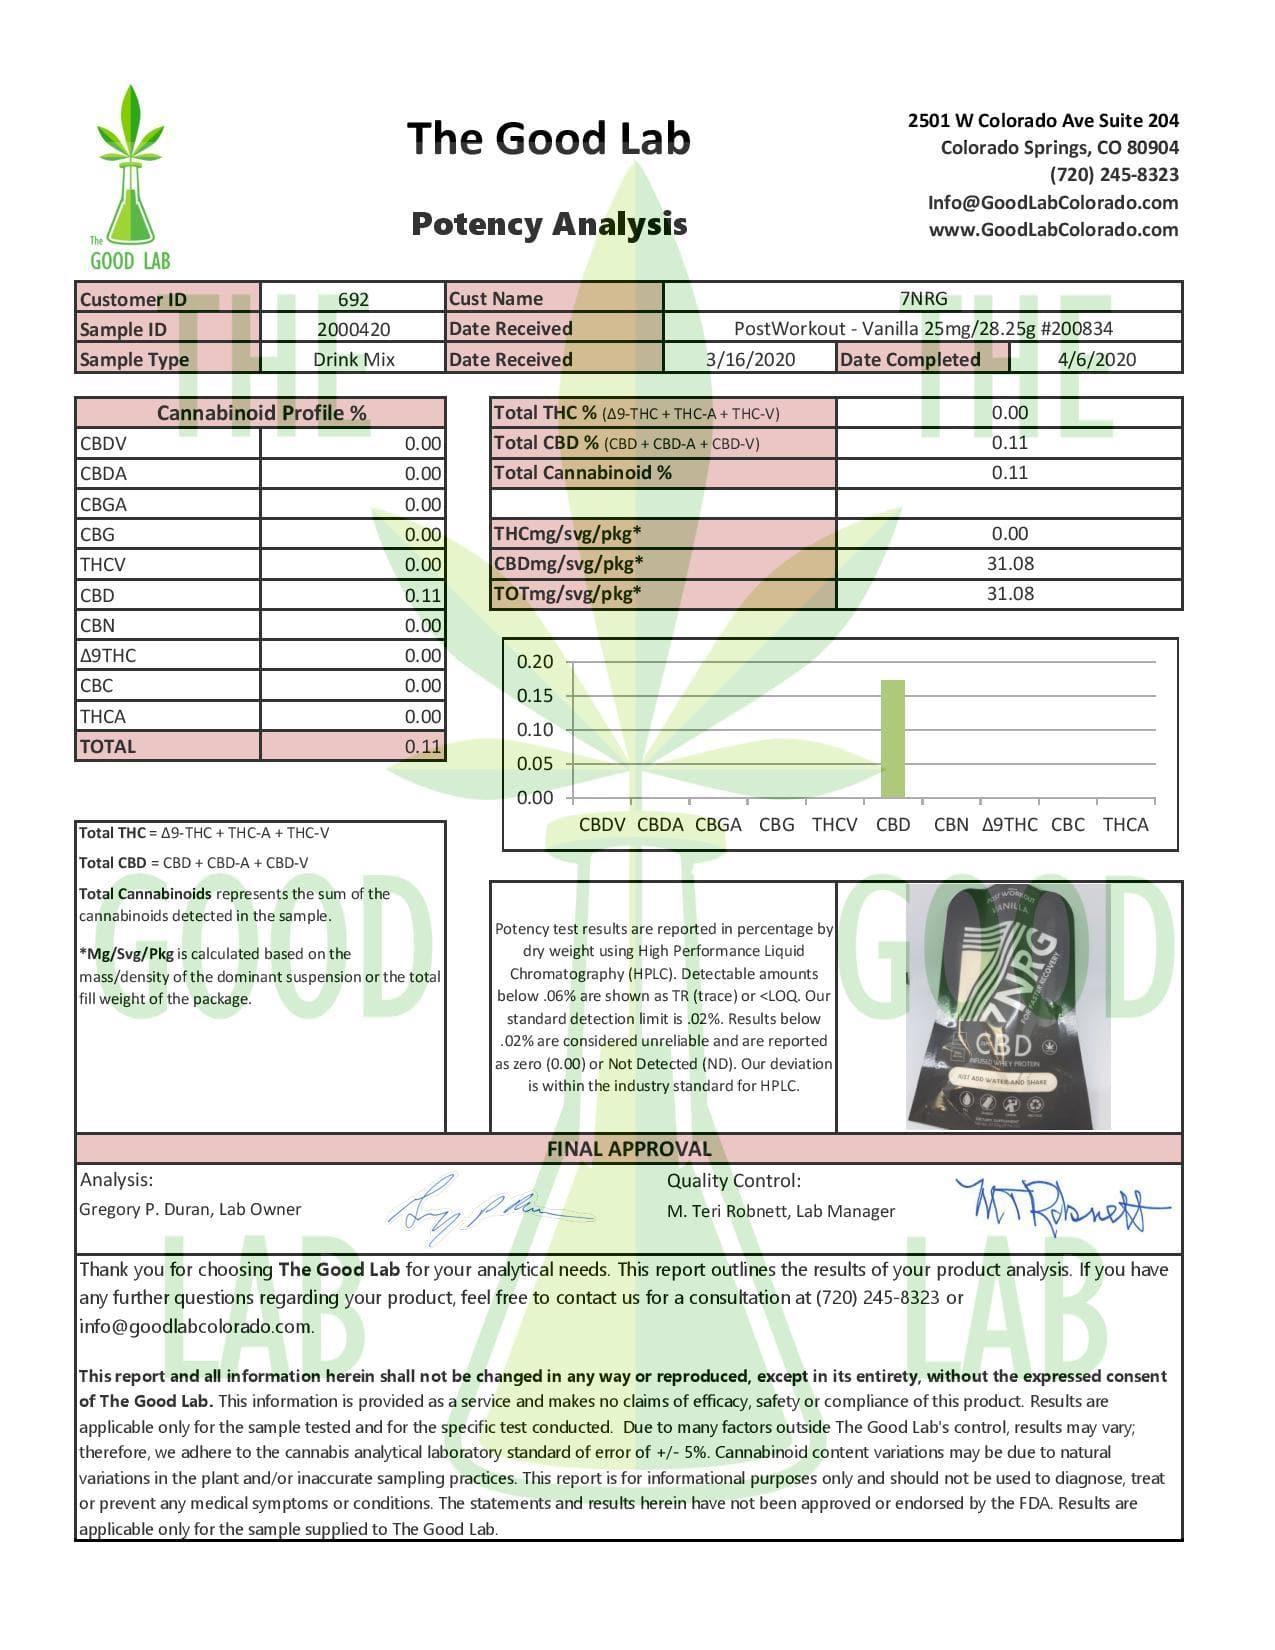 JWNBG0236X0073 1 525x679 - 12 x 7NRG Post-Workout Vanilla 25mg CBD Protein Shake